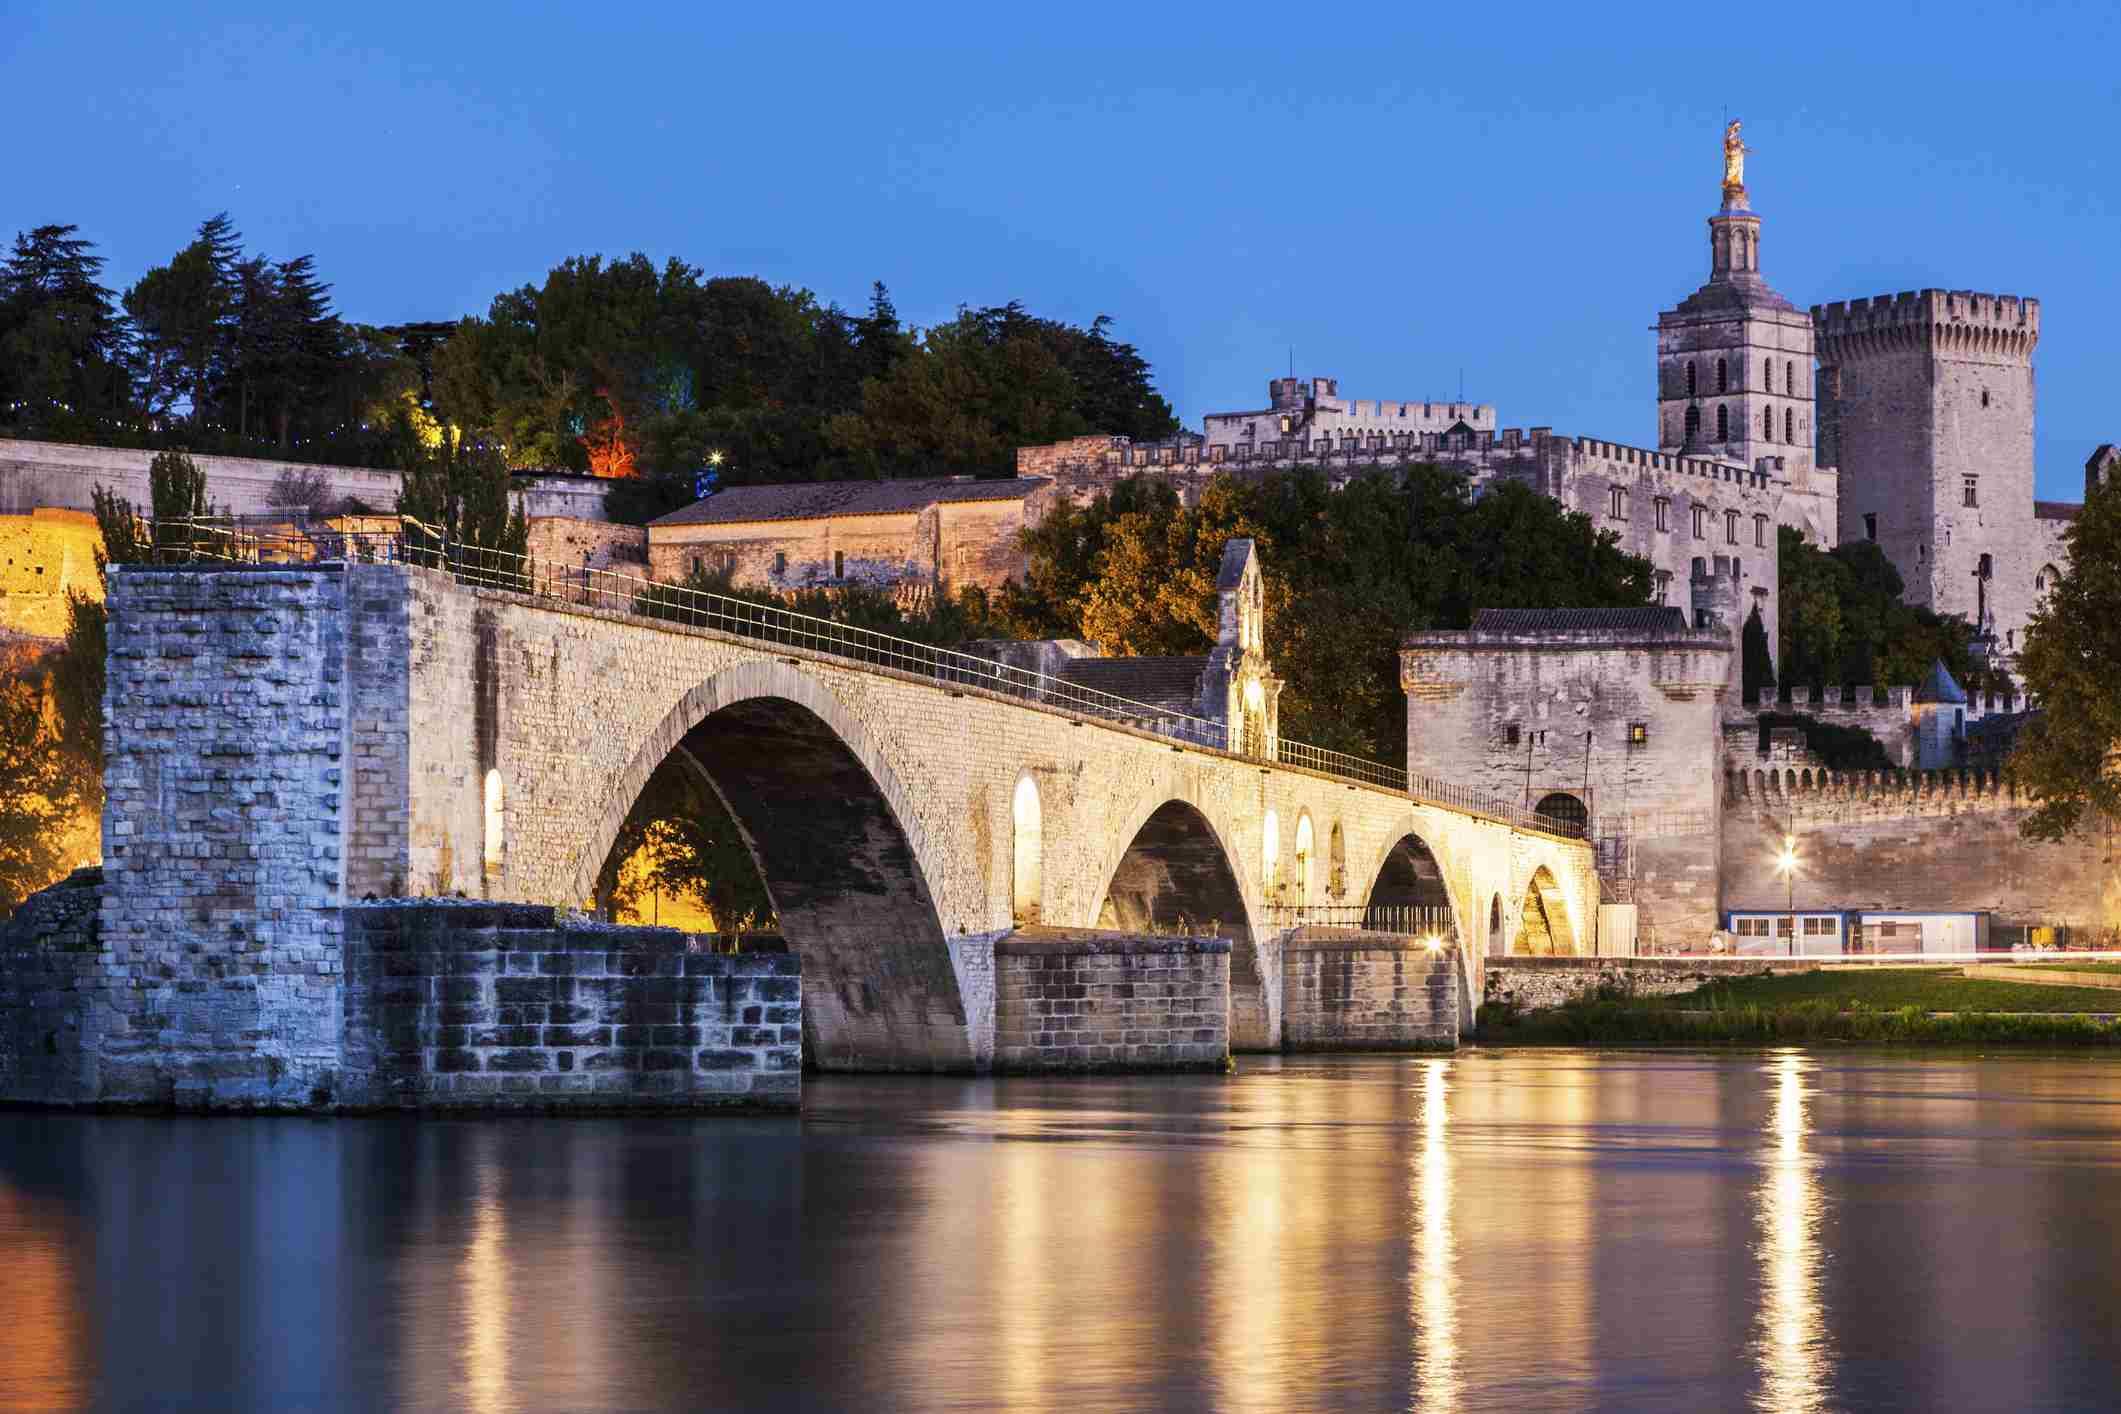 France, Provence-Alpes-Cote dAzur, Avignon, Pont Saint-Benezet on Rhone River and Avignon Cathedral at dusk